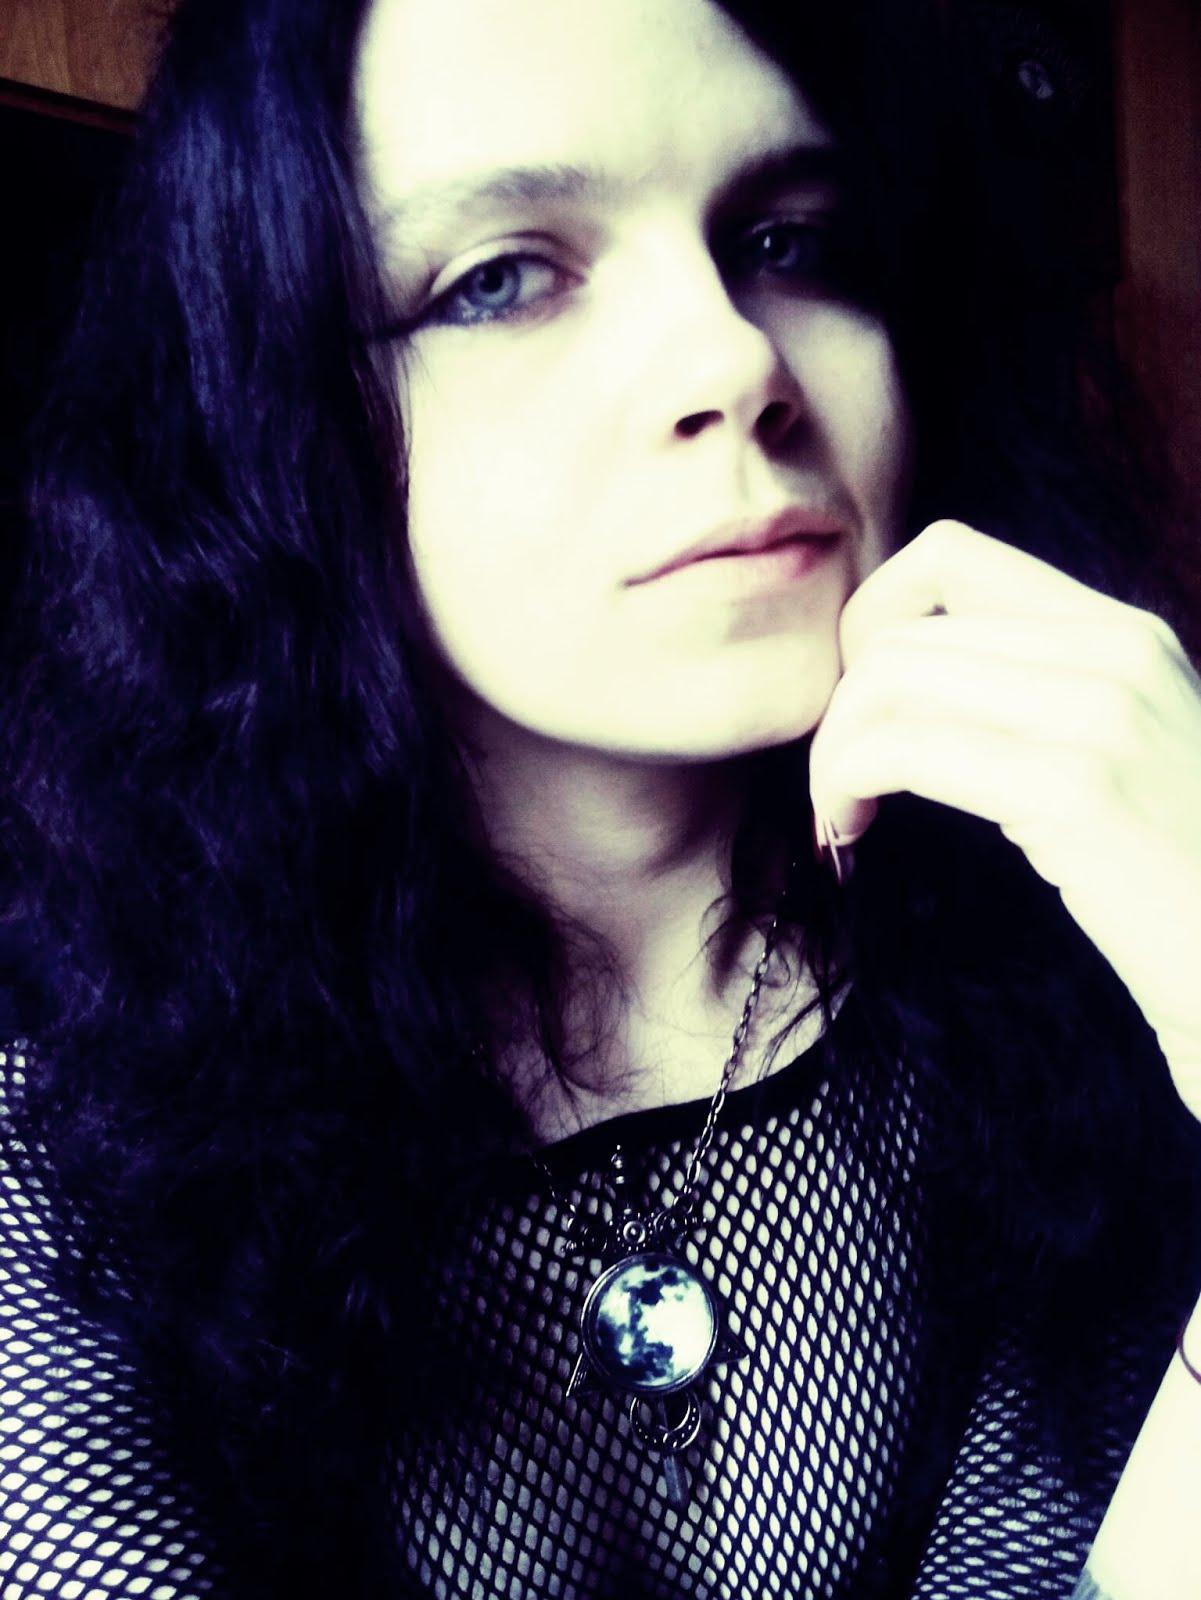 ☥ Judith Lorelei Van Salem ☥